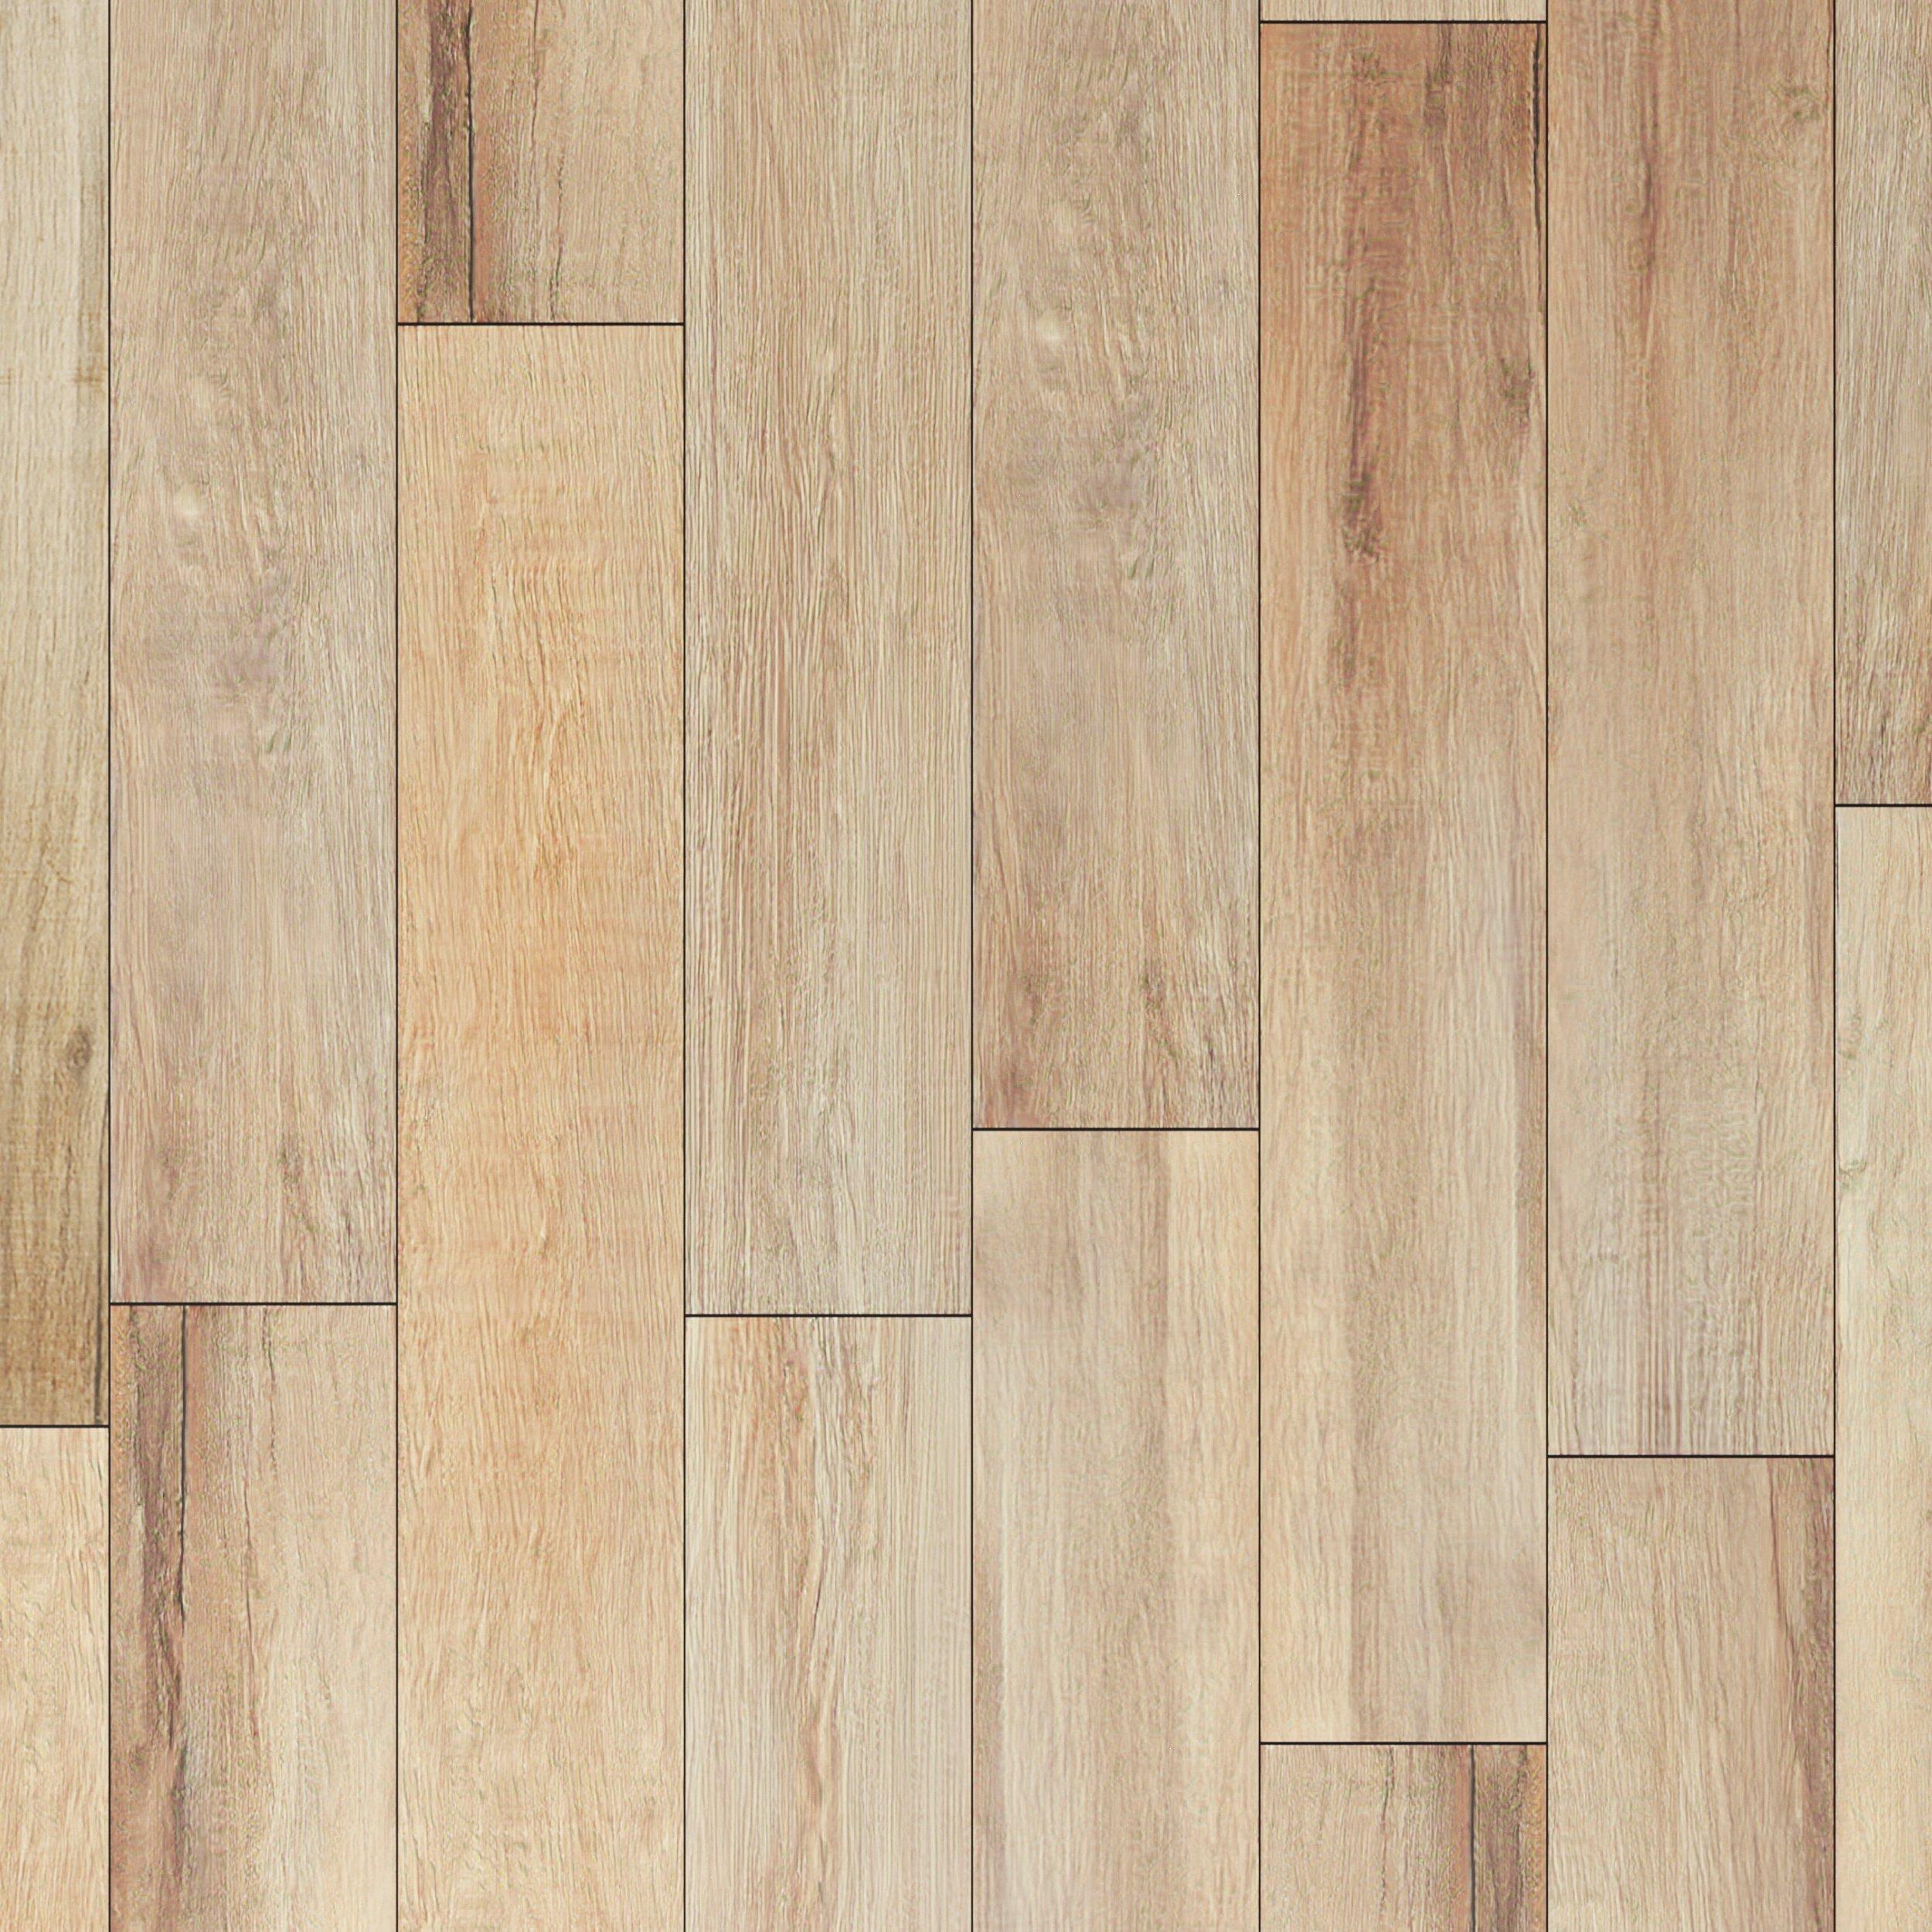 wynnwood natural wood plank porcelain